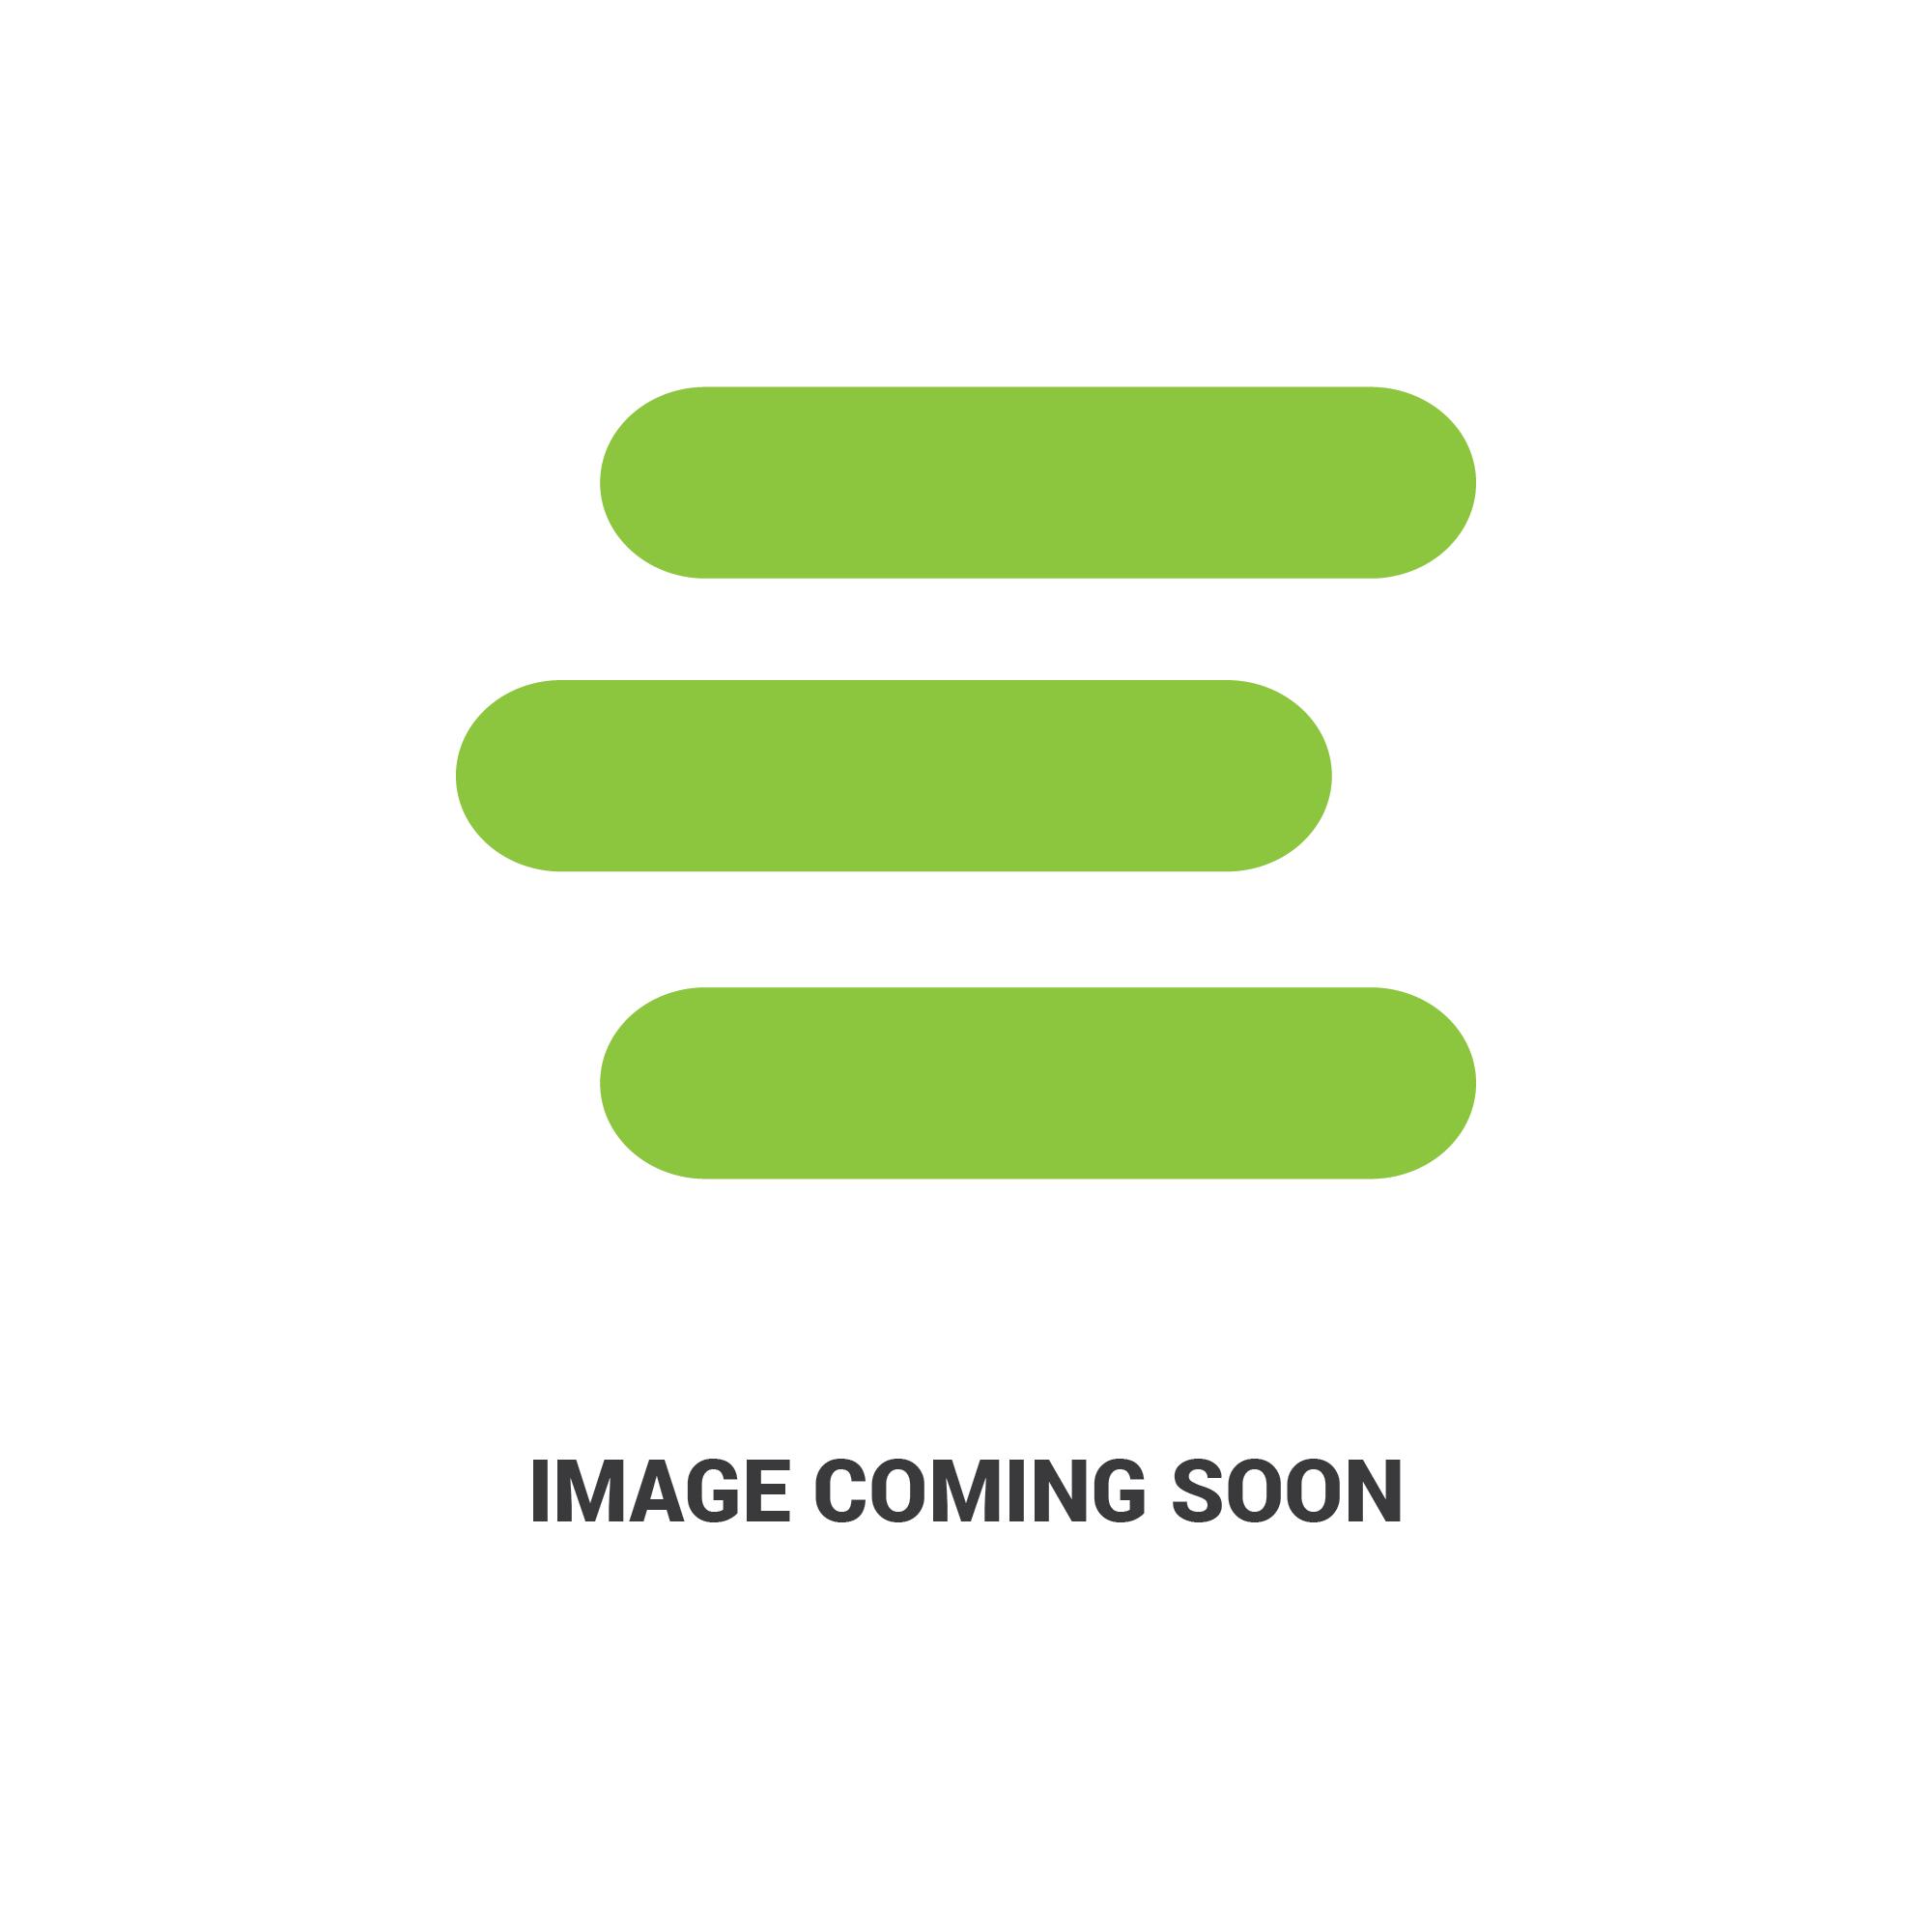 E-76650-351021193_1.jpg